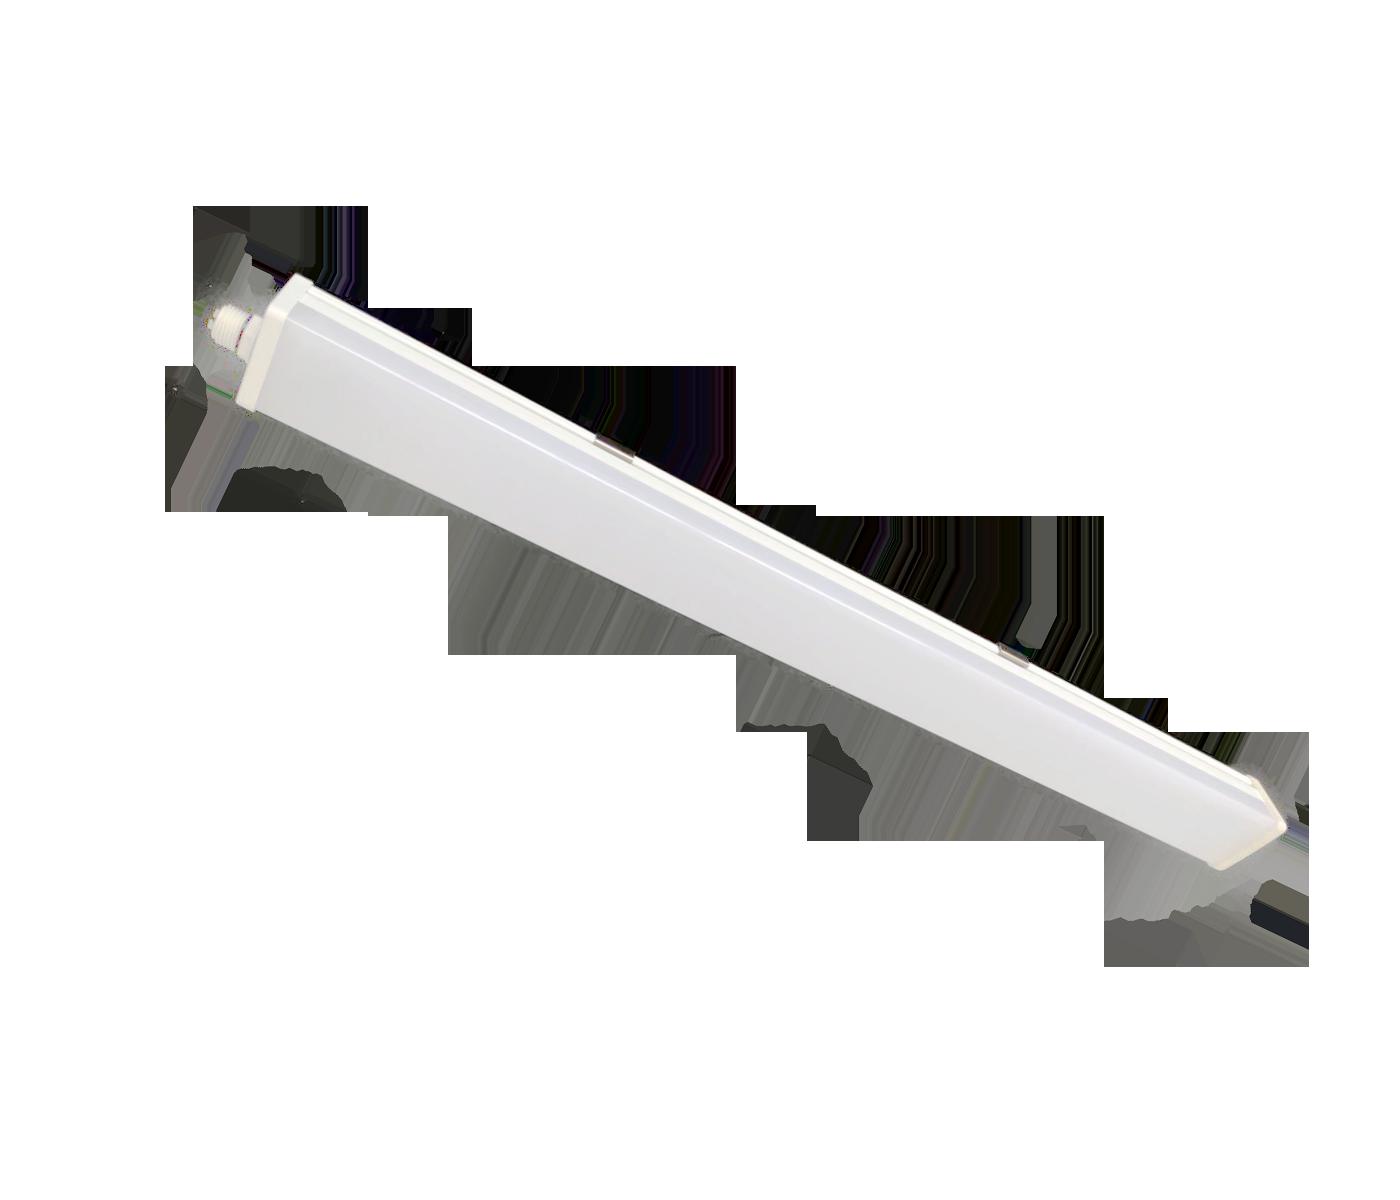 slim led lights